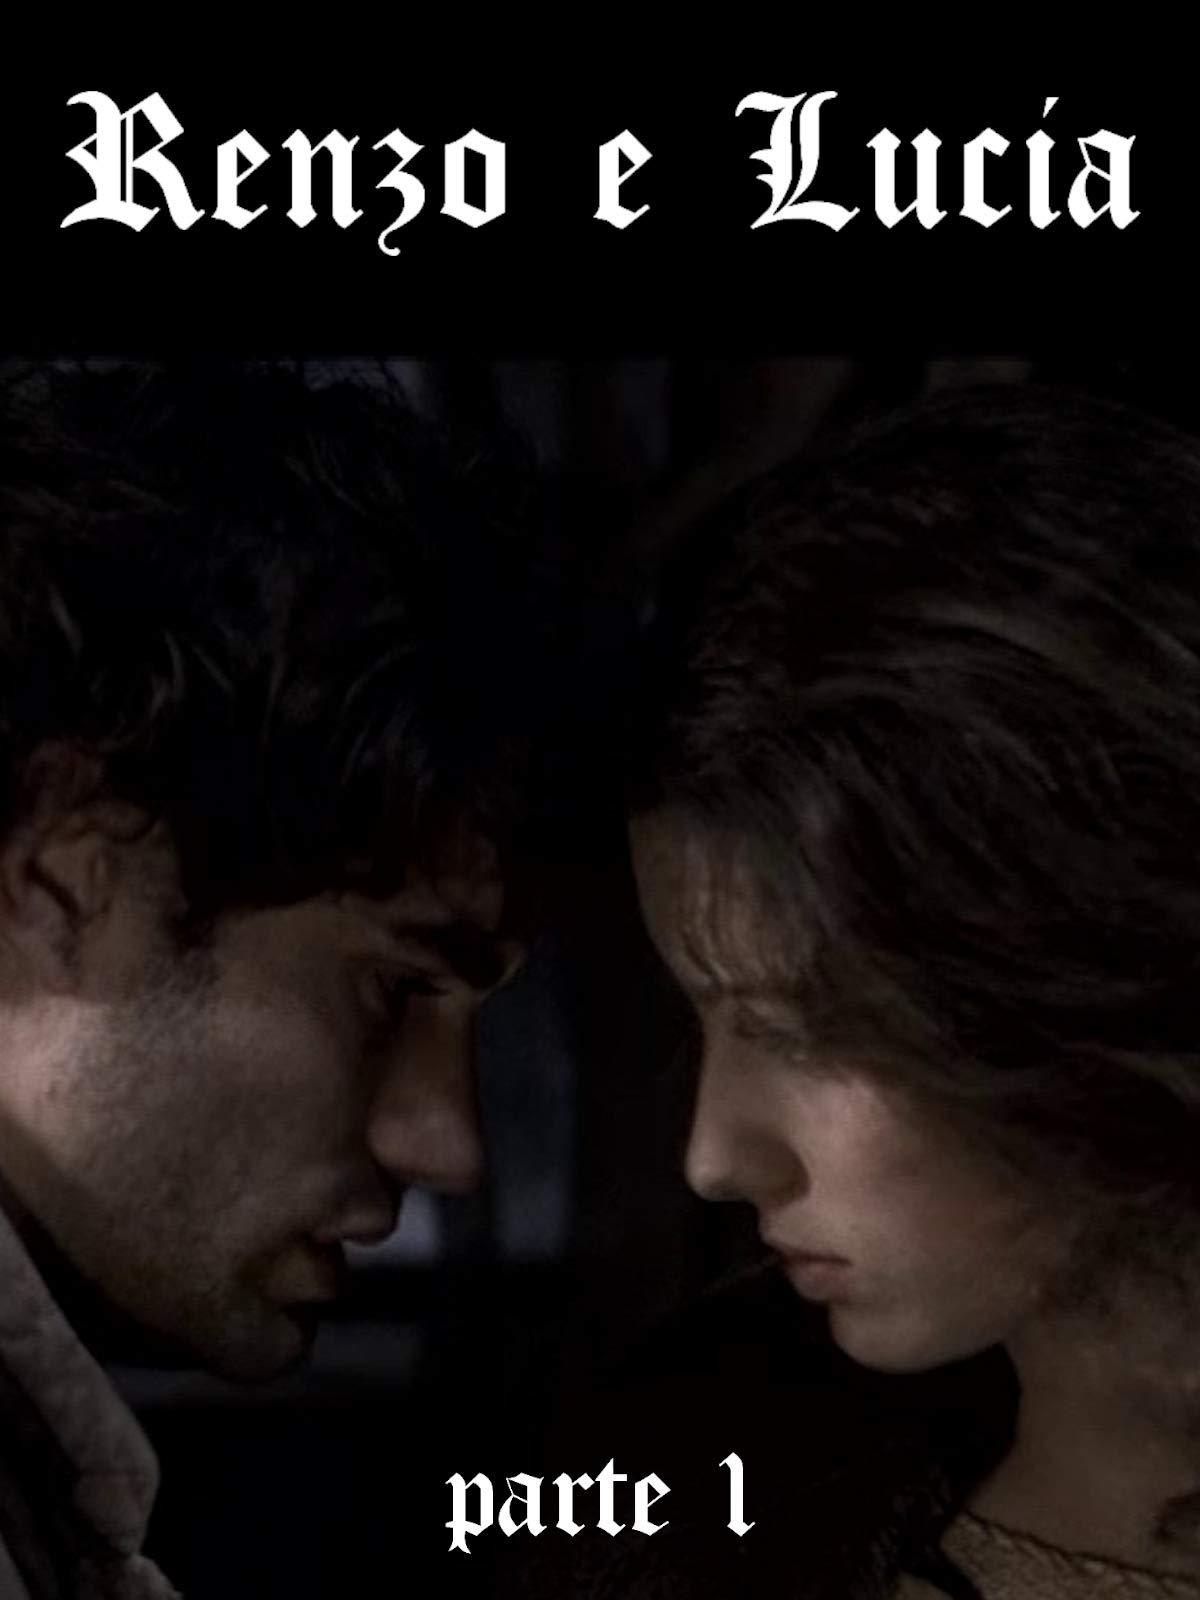 Renzo & Lucia - Part 1 on Amazon Prime Video UK